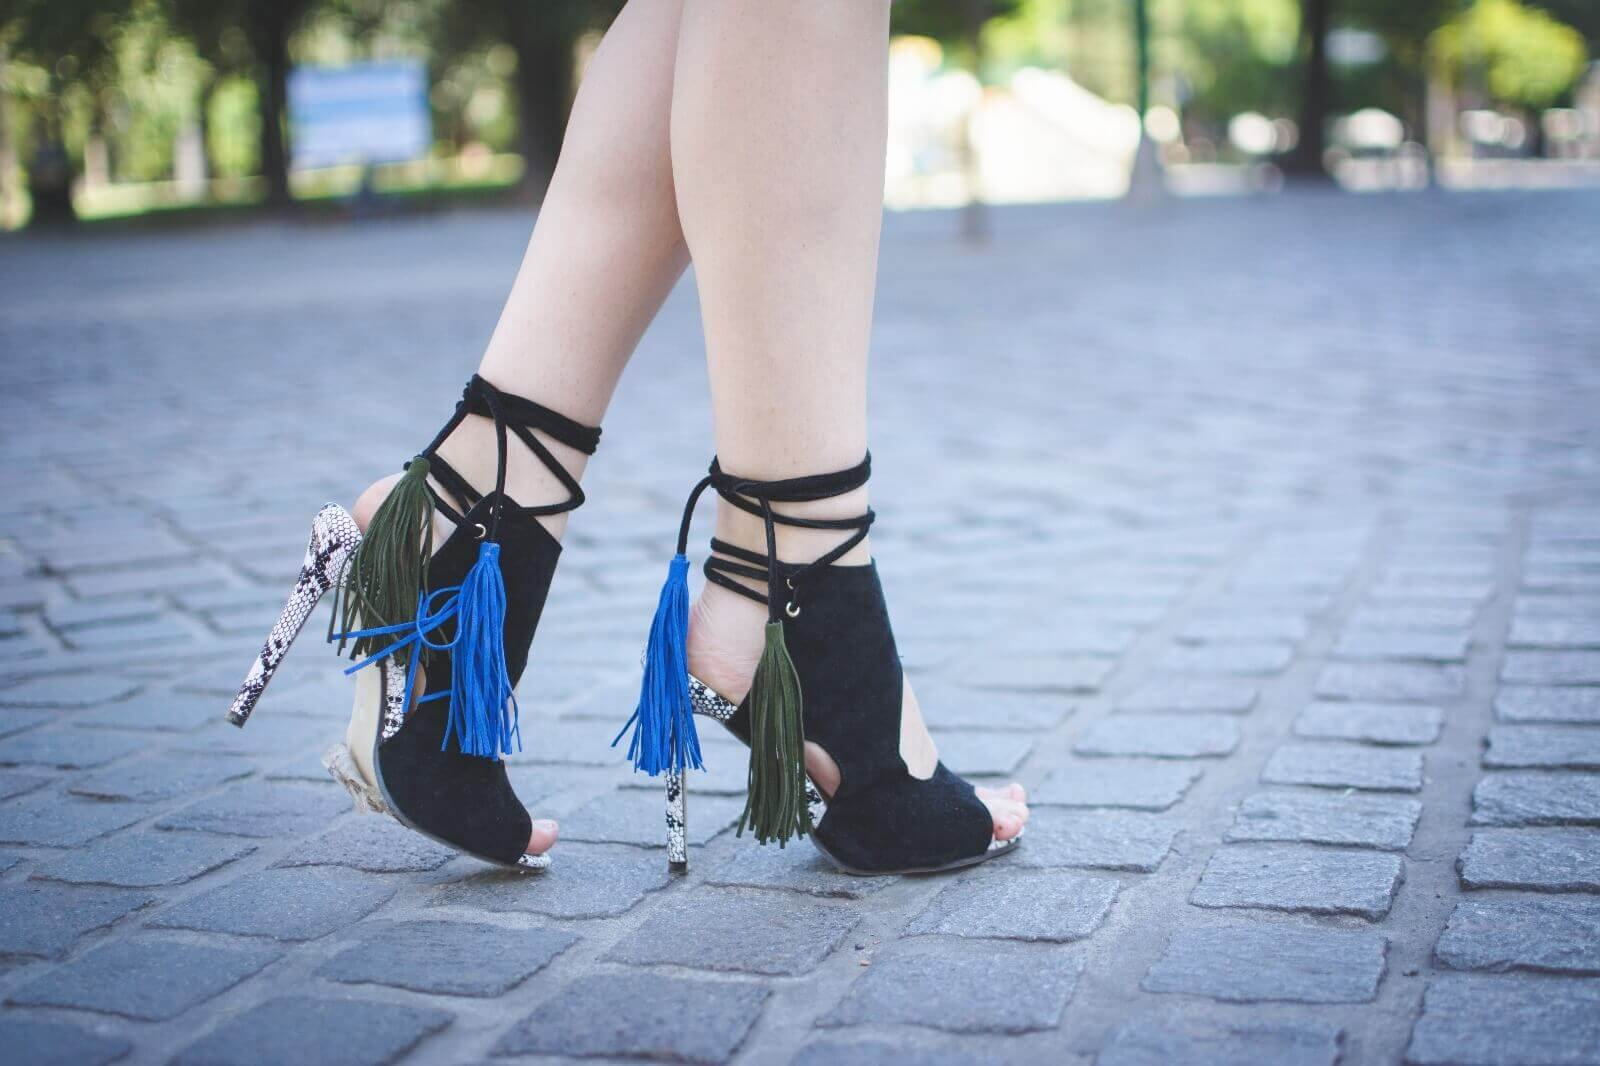 zaful-statement-shoes-silver-mirrored-sunglasses-deborah-ferrero-streetstyle-style-by-deb06